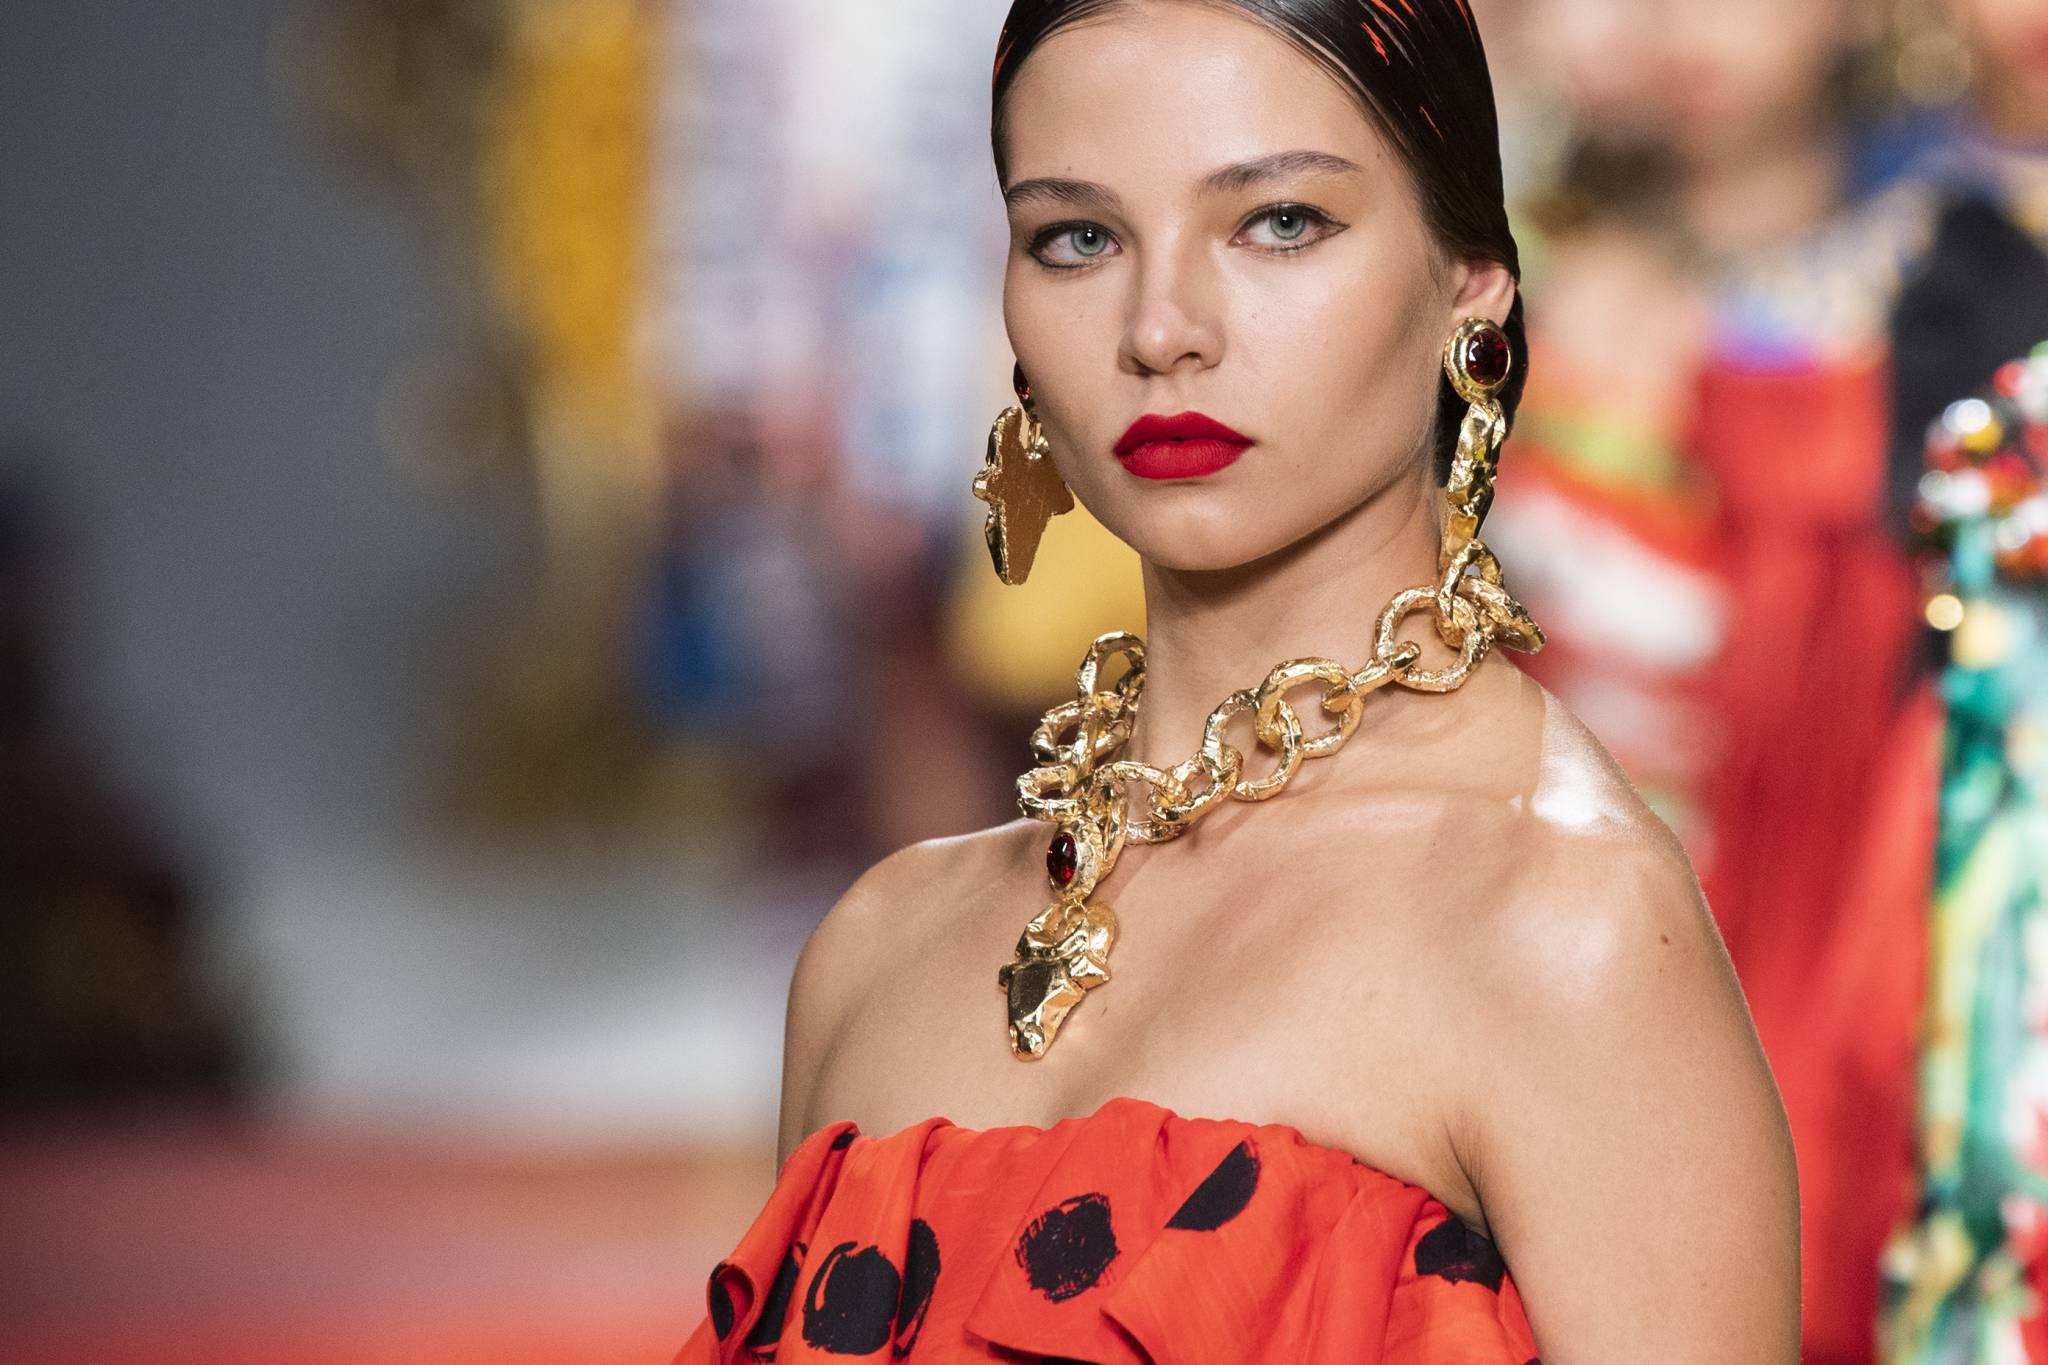 Najpiękniejsza biżuteria na sezon wiosna-lato 2021